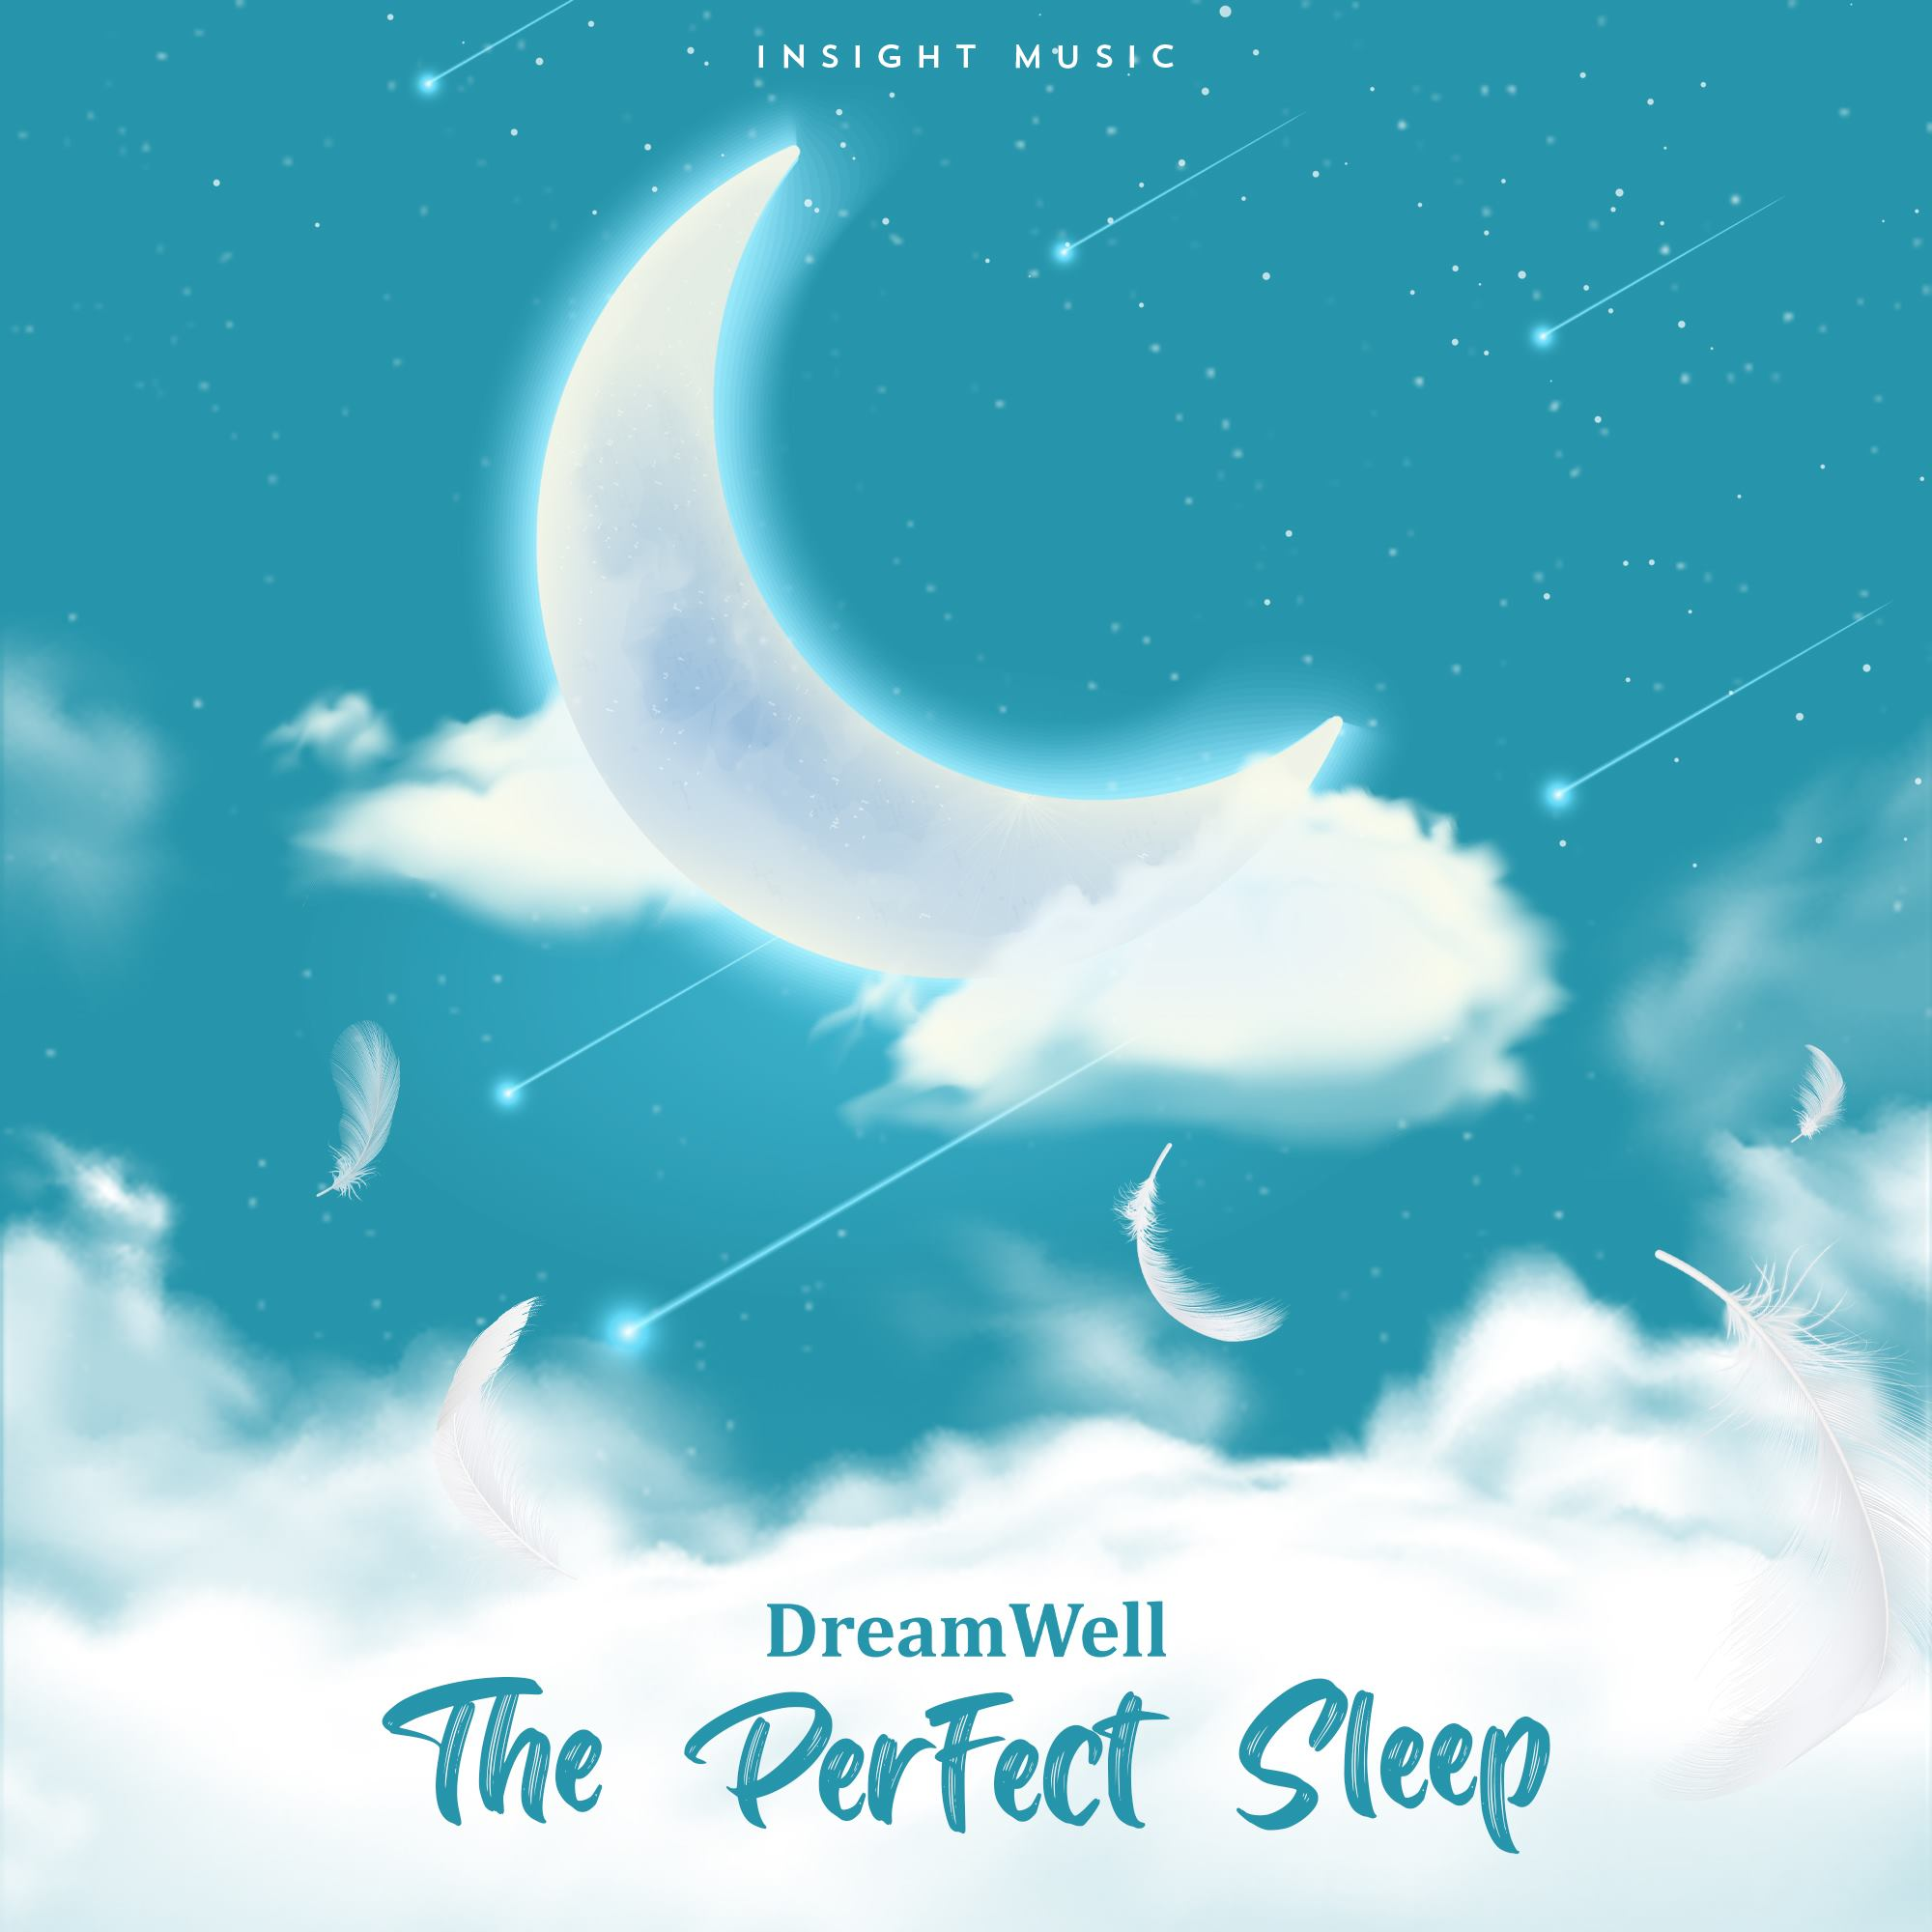 Having trouble sleeping? Insight Music releases sleep-inducing album